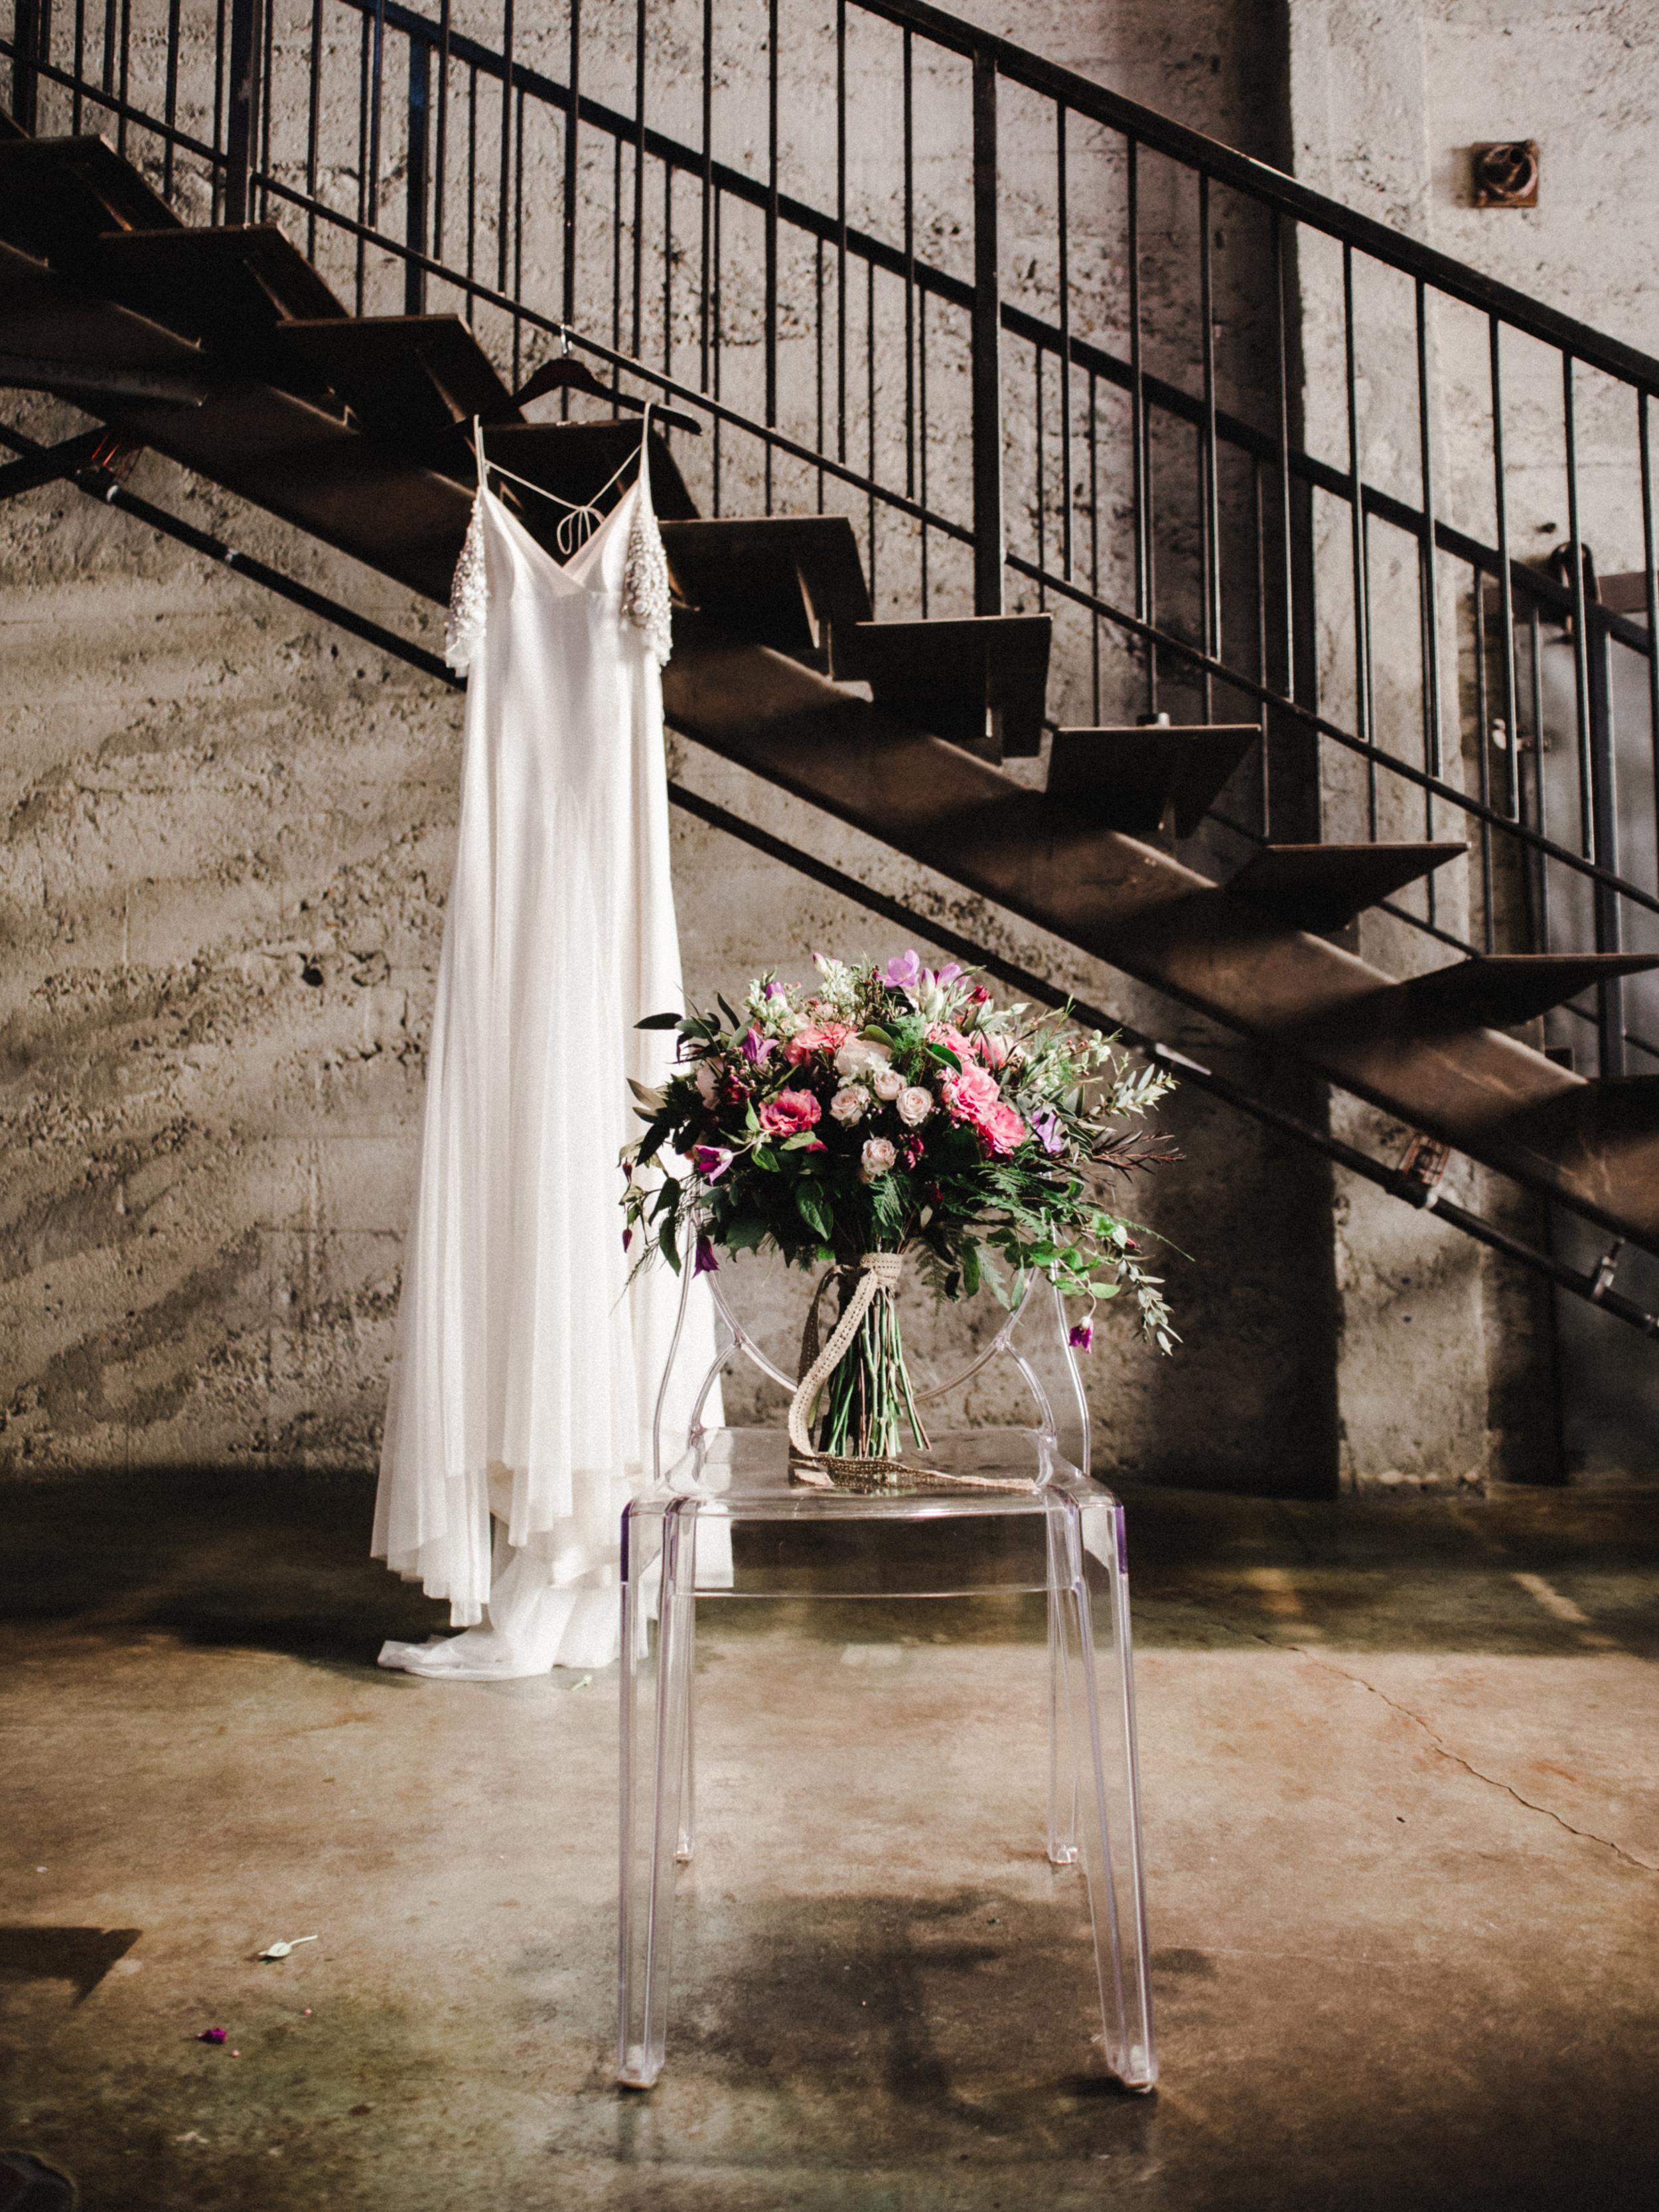 MeghanElise Photography - Luce Loft Wedding Inspiration - 7M8A4881.jpg